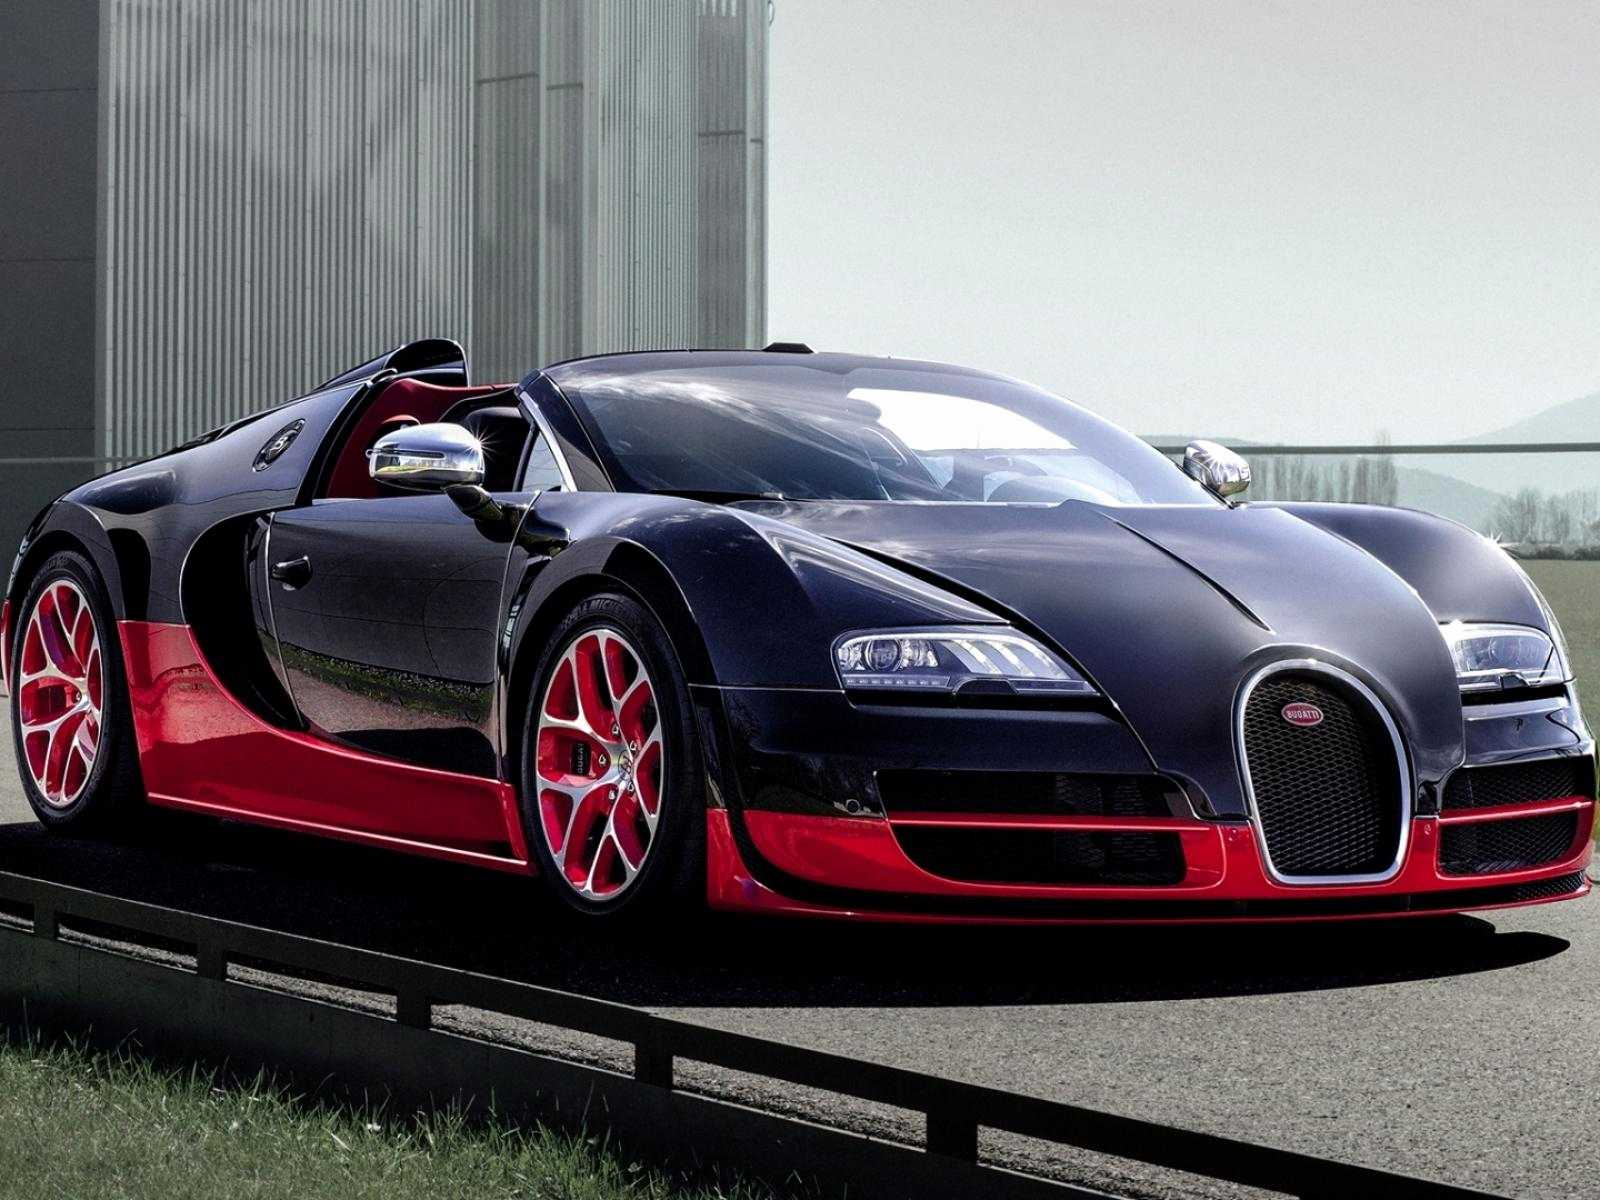 2012 Bugatti Veyron 16.4 Grand Sport , HD Wallpaper & Backgrounds